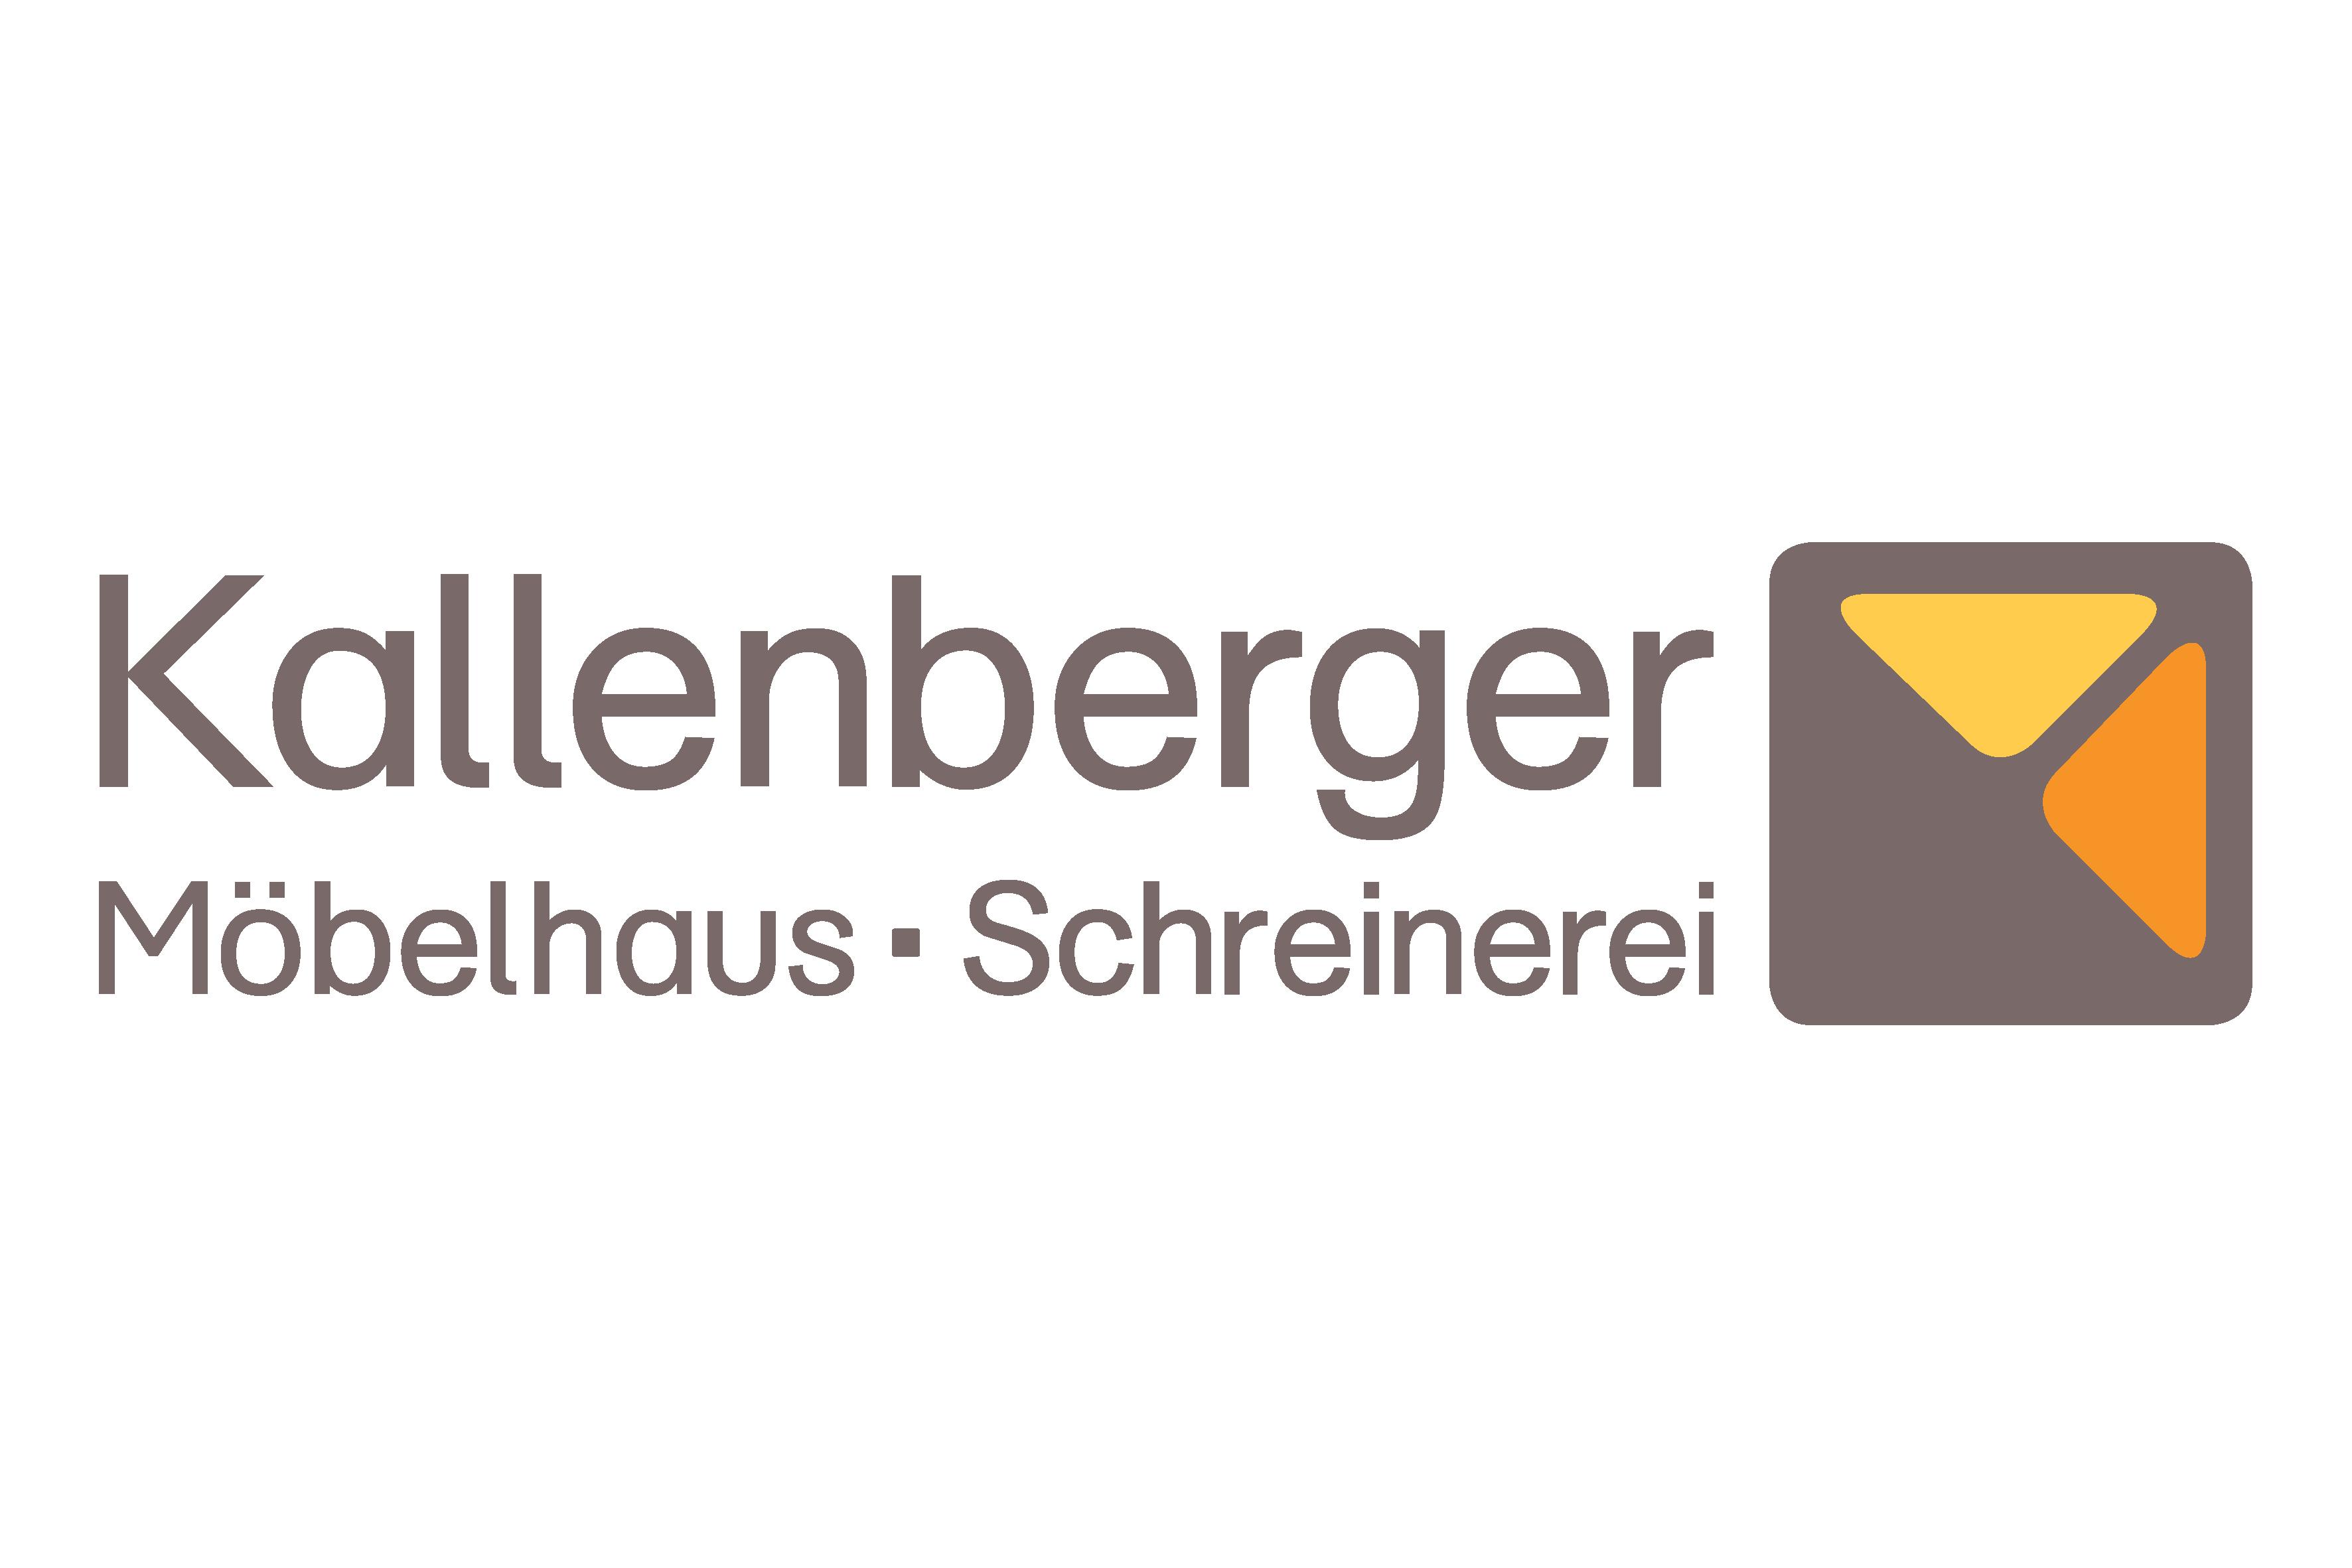 kallenberger-gmbh--co-kg--gundelsheim logo